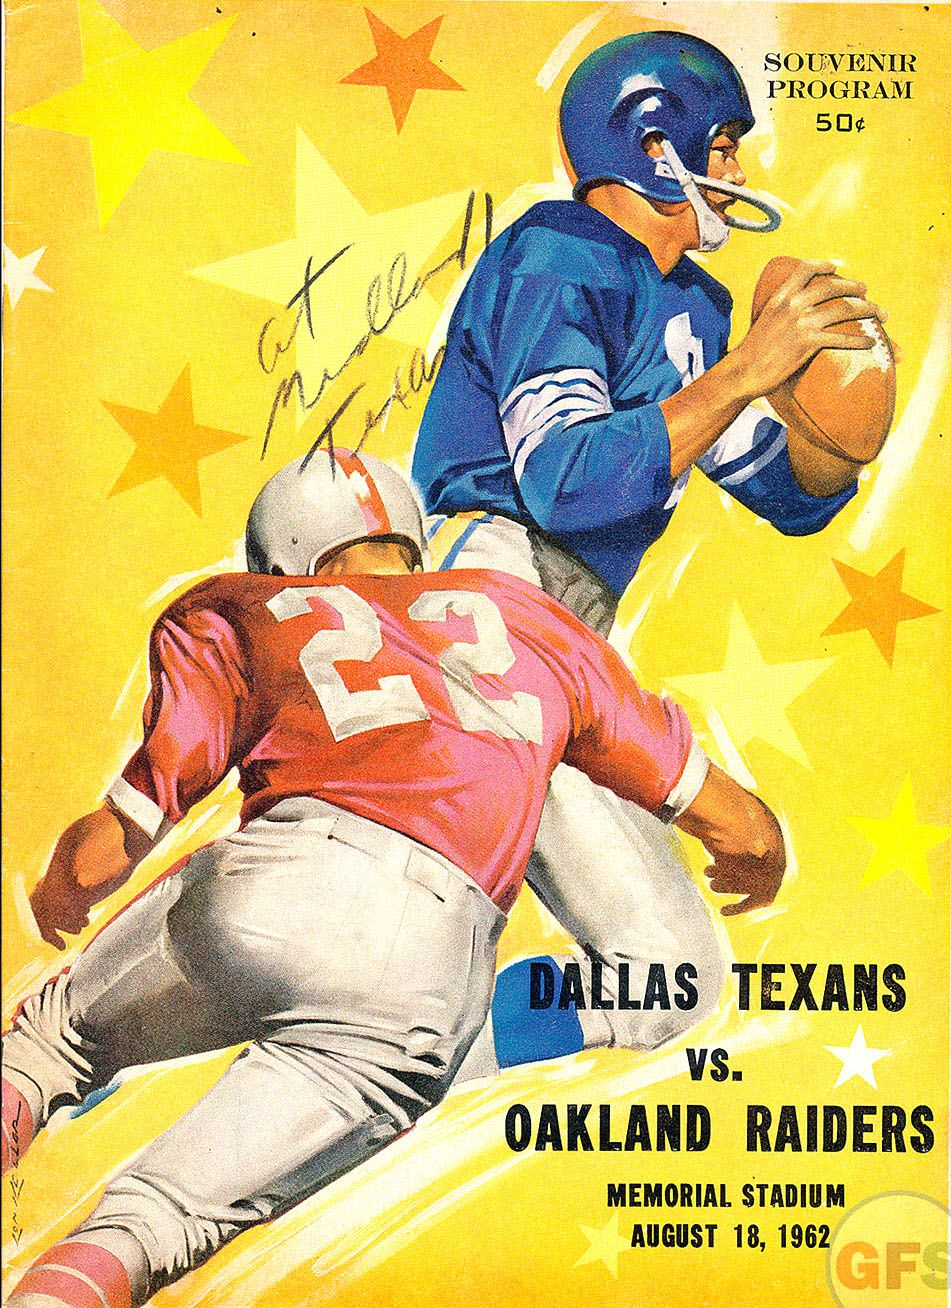 1962 AFL Preseason Game Program Dallas Texans vs. Oakland Raiders Oakland  Raiders Football 7c3238b5c0f7b